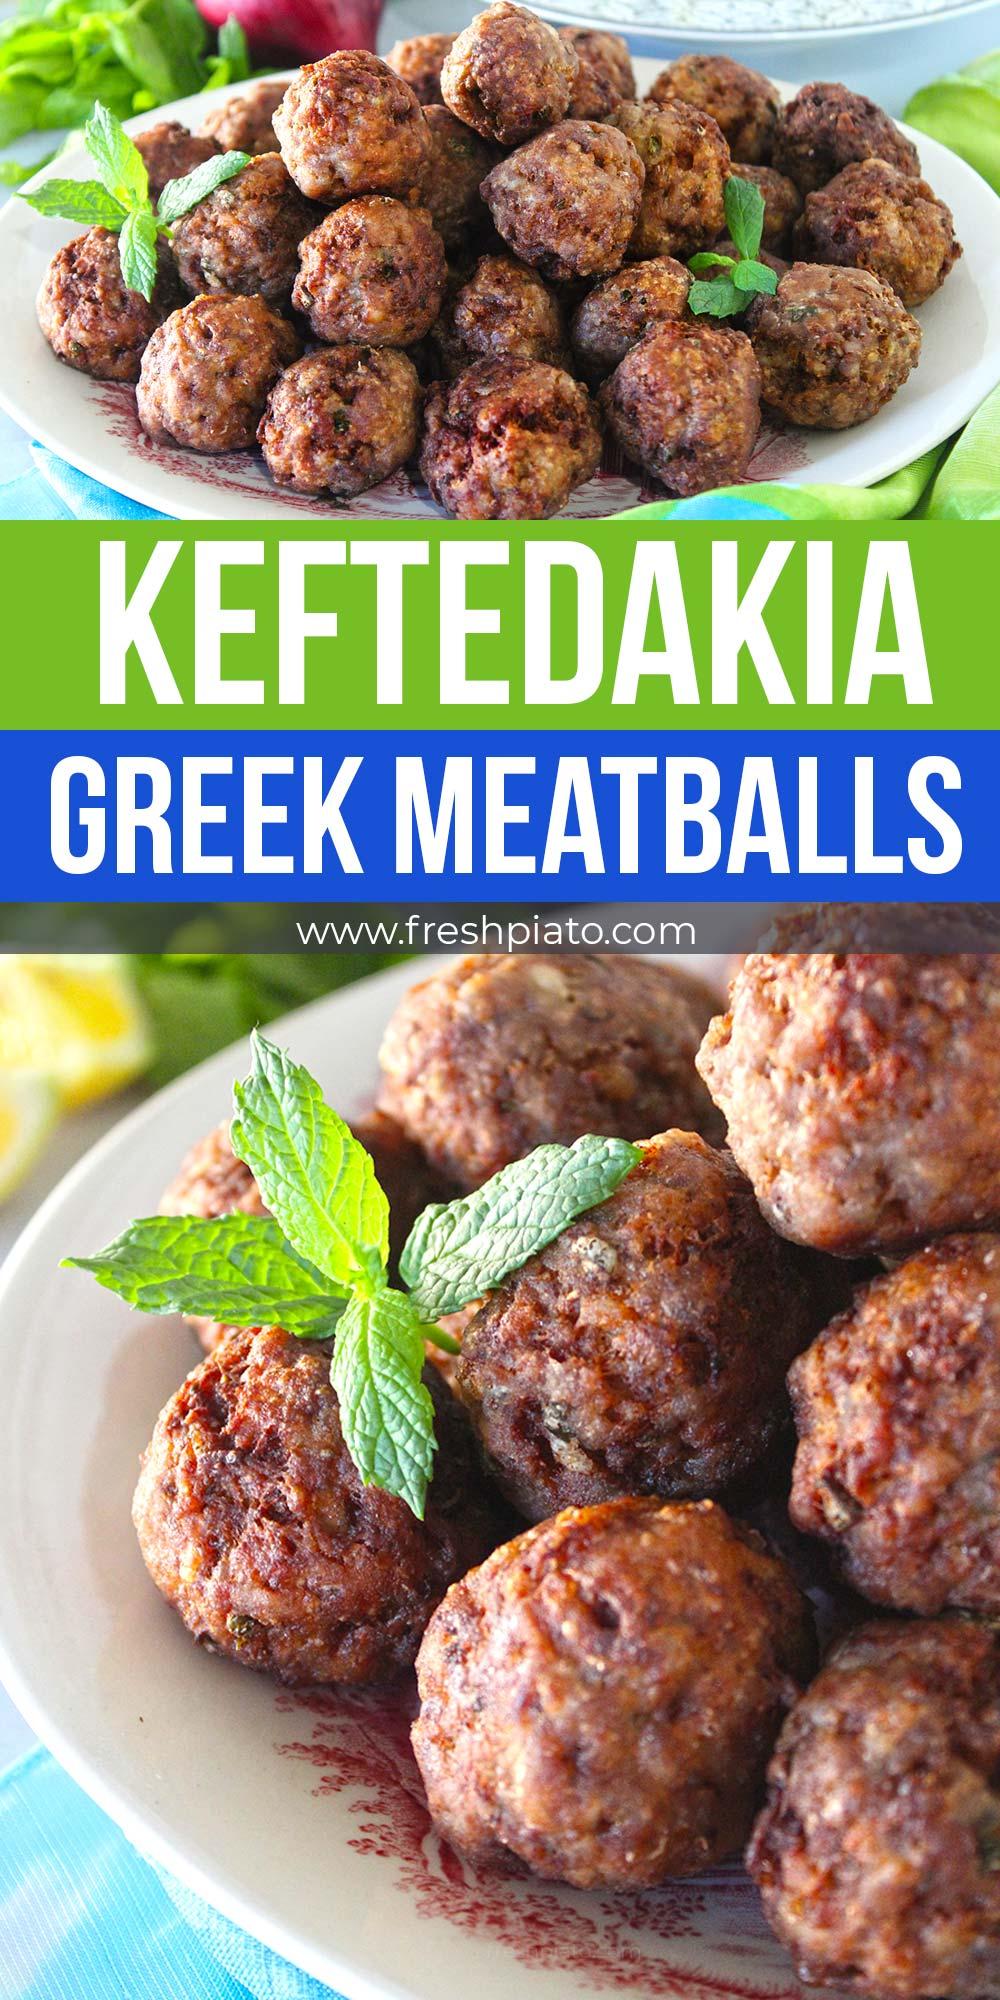 keftedakia greek meatballs recipe